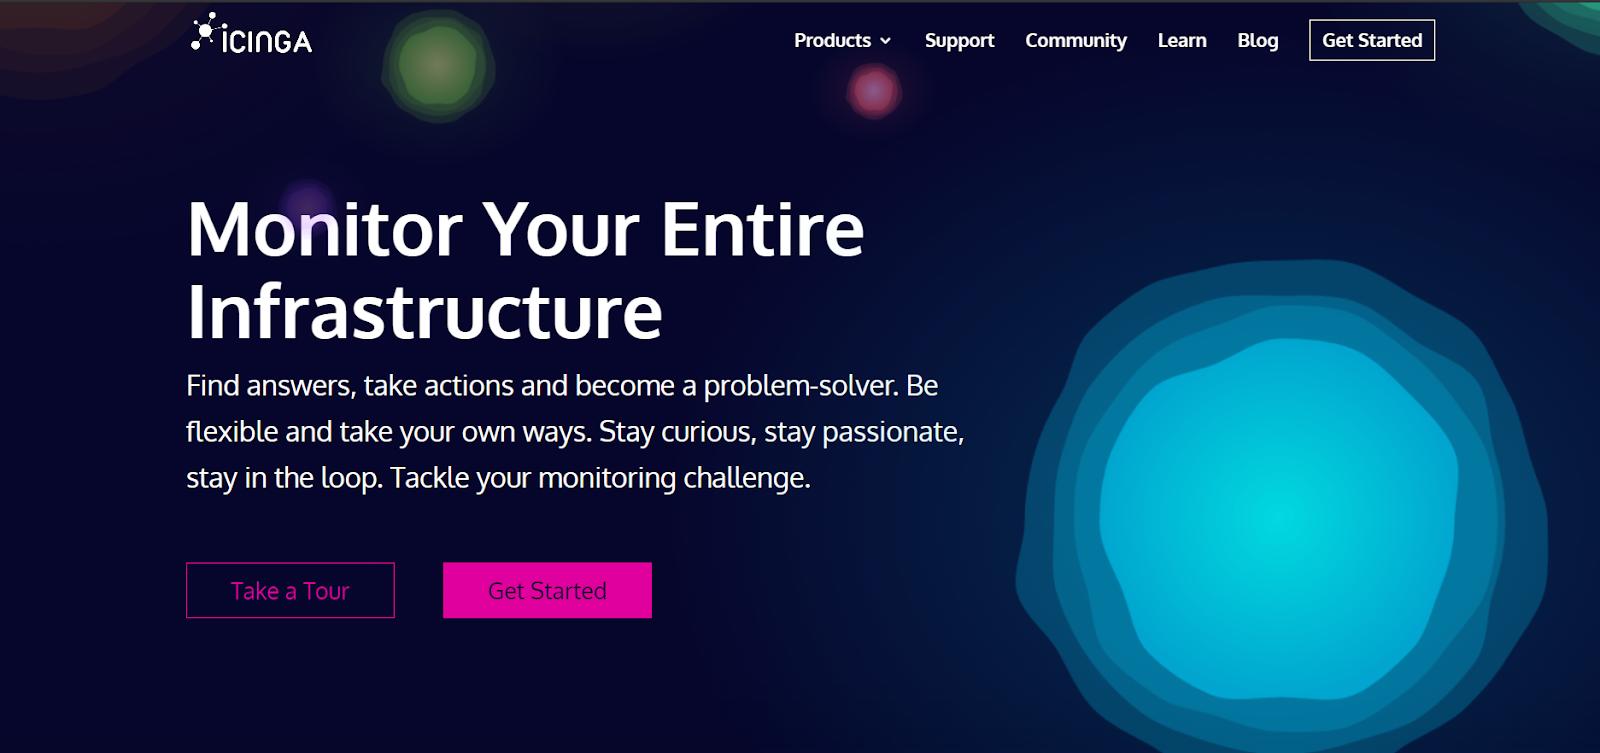 Icinga Network Performance Monitoring Tool